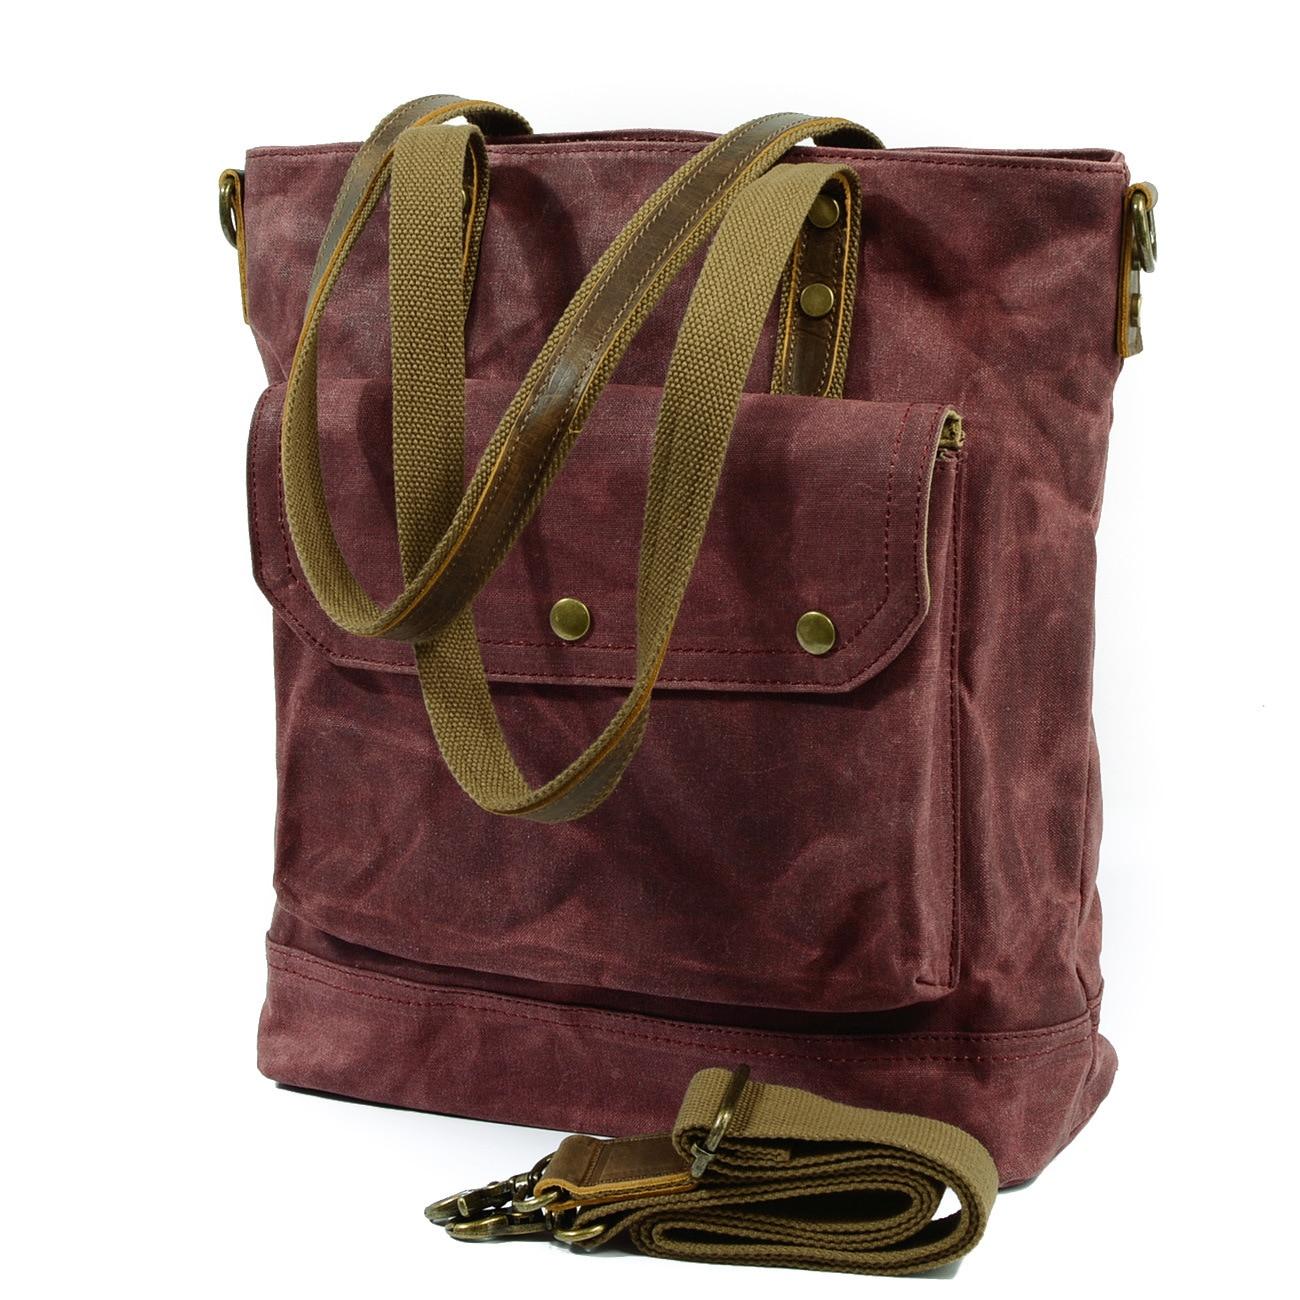 Man Crossbody bag Multifunction Men bag Retro handbags Women Waxed Canvas Bag Shoulder Messenger Bags Leisure Waterproof Package